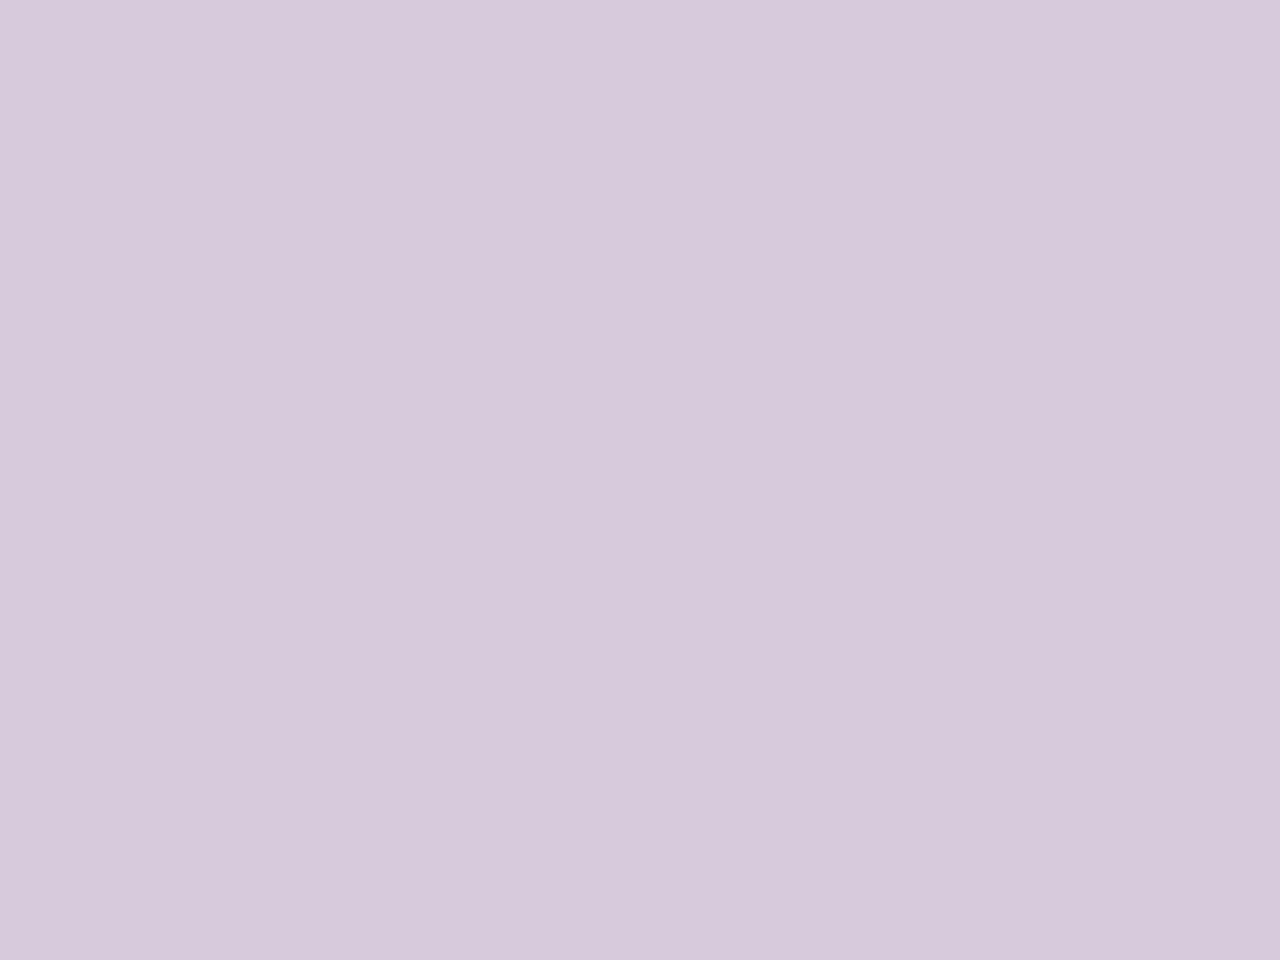 1280x960 Languid Lavender Solid Color Background